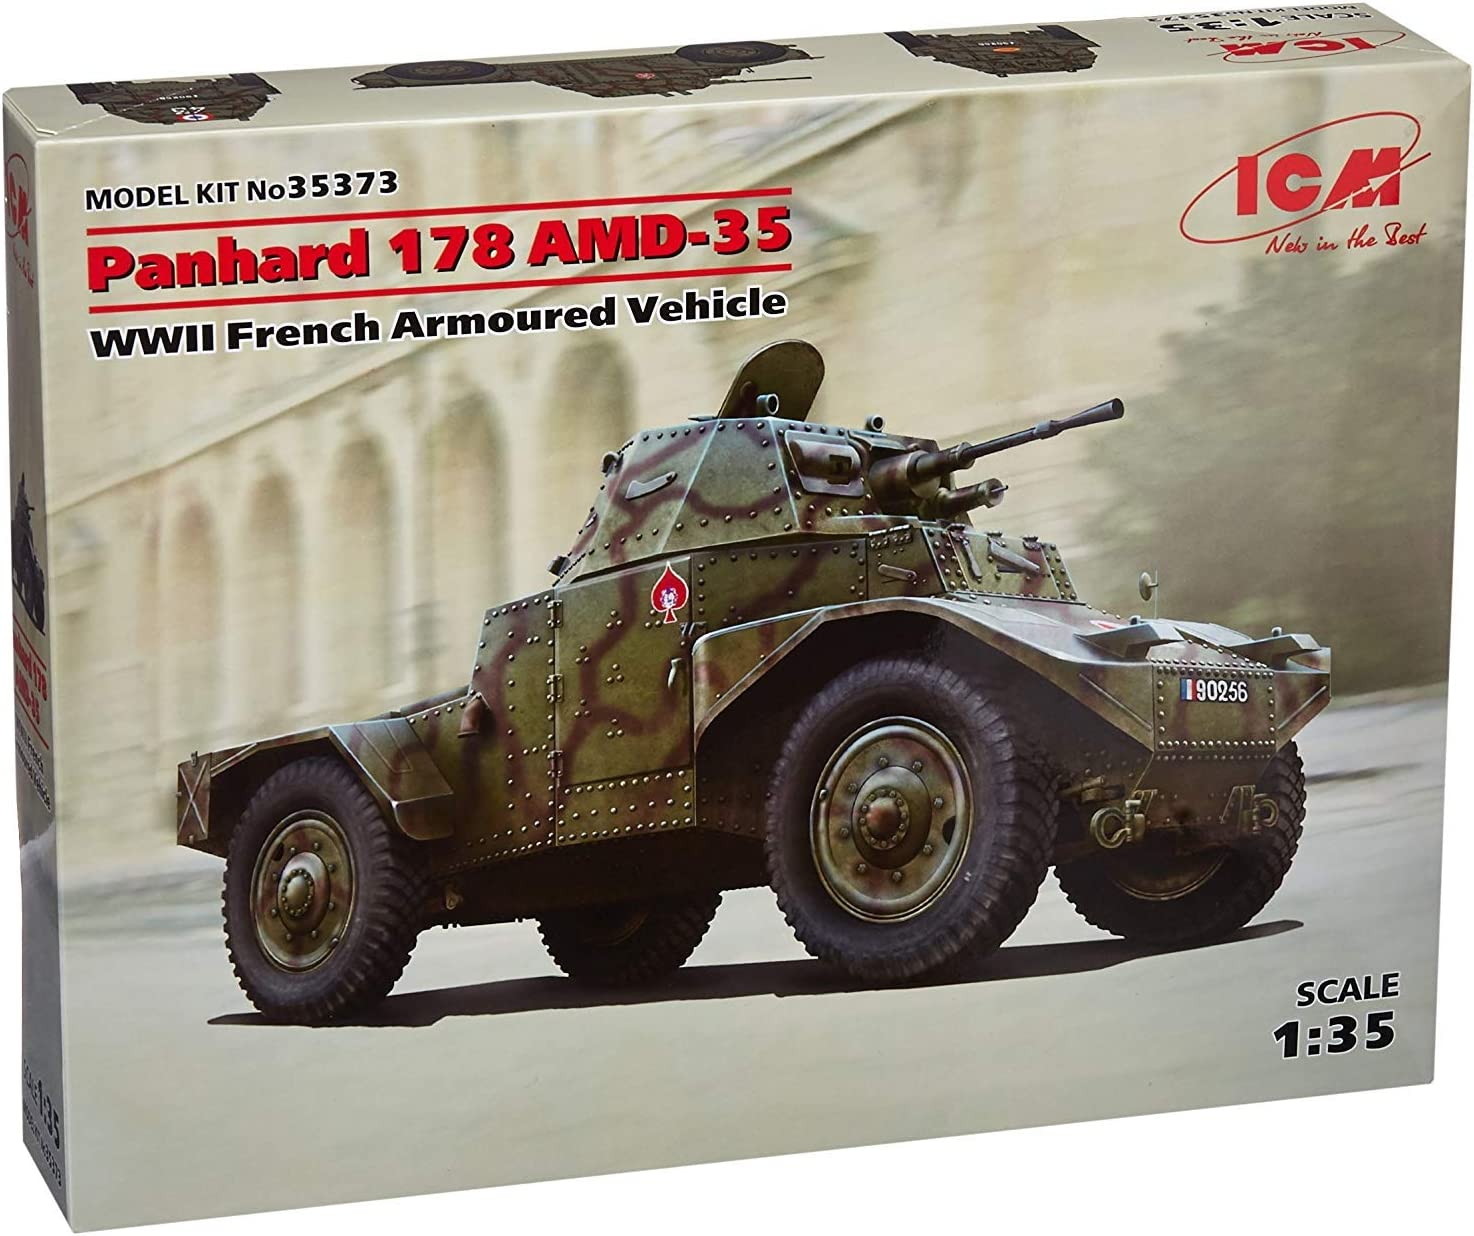 ICM ICM35373 1:35-Panhard 178 AMD-35